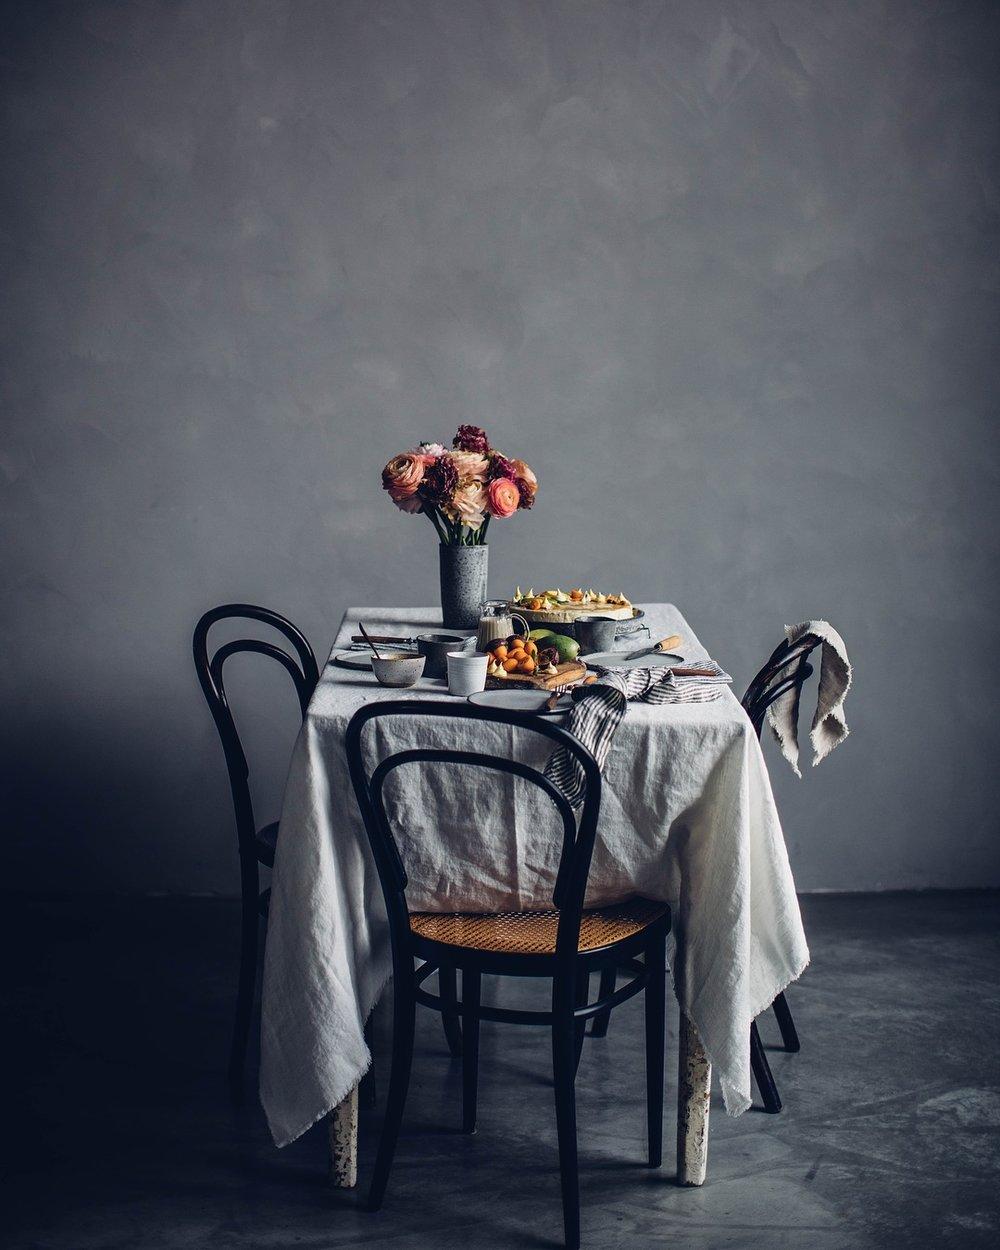 https://www.instagram.com/p/BuwATJFglG-/Our Food Stories